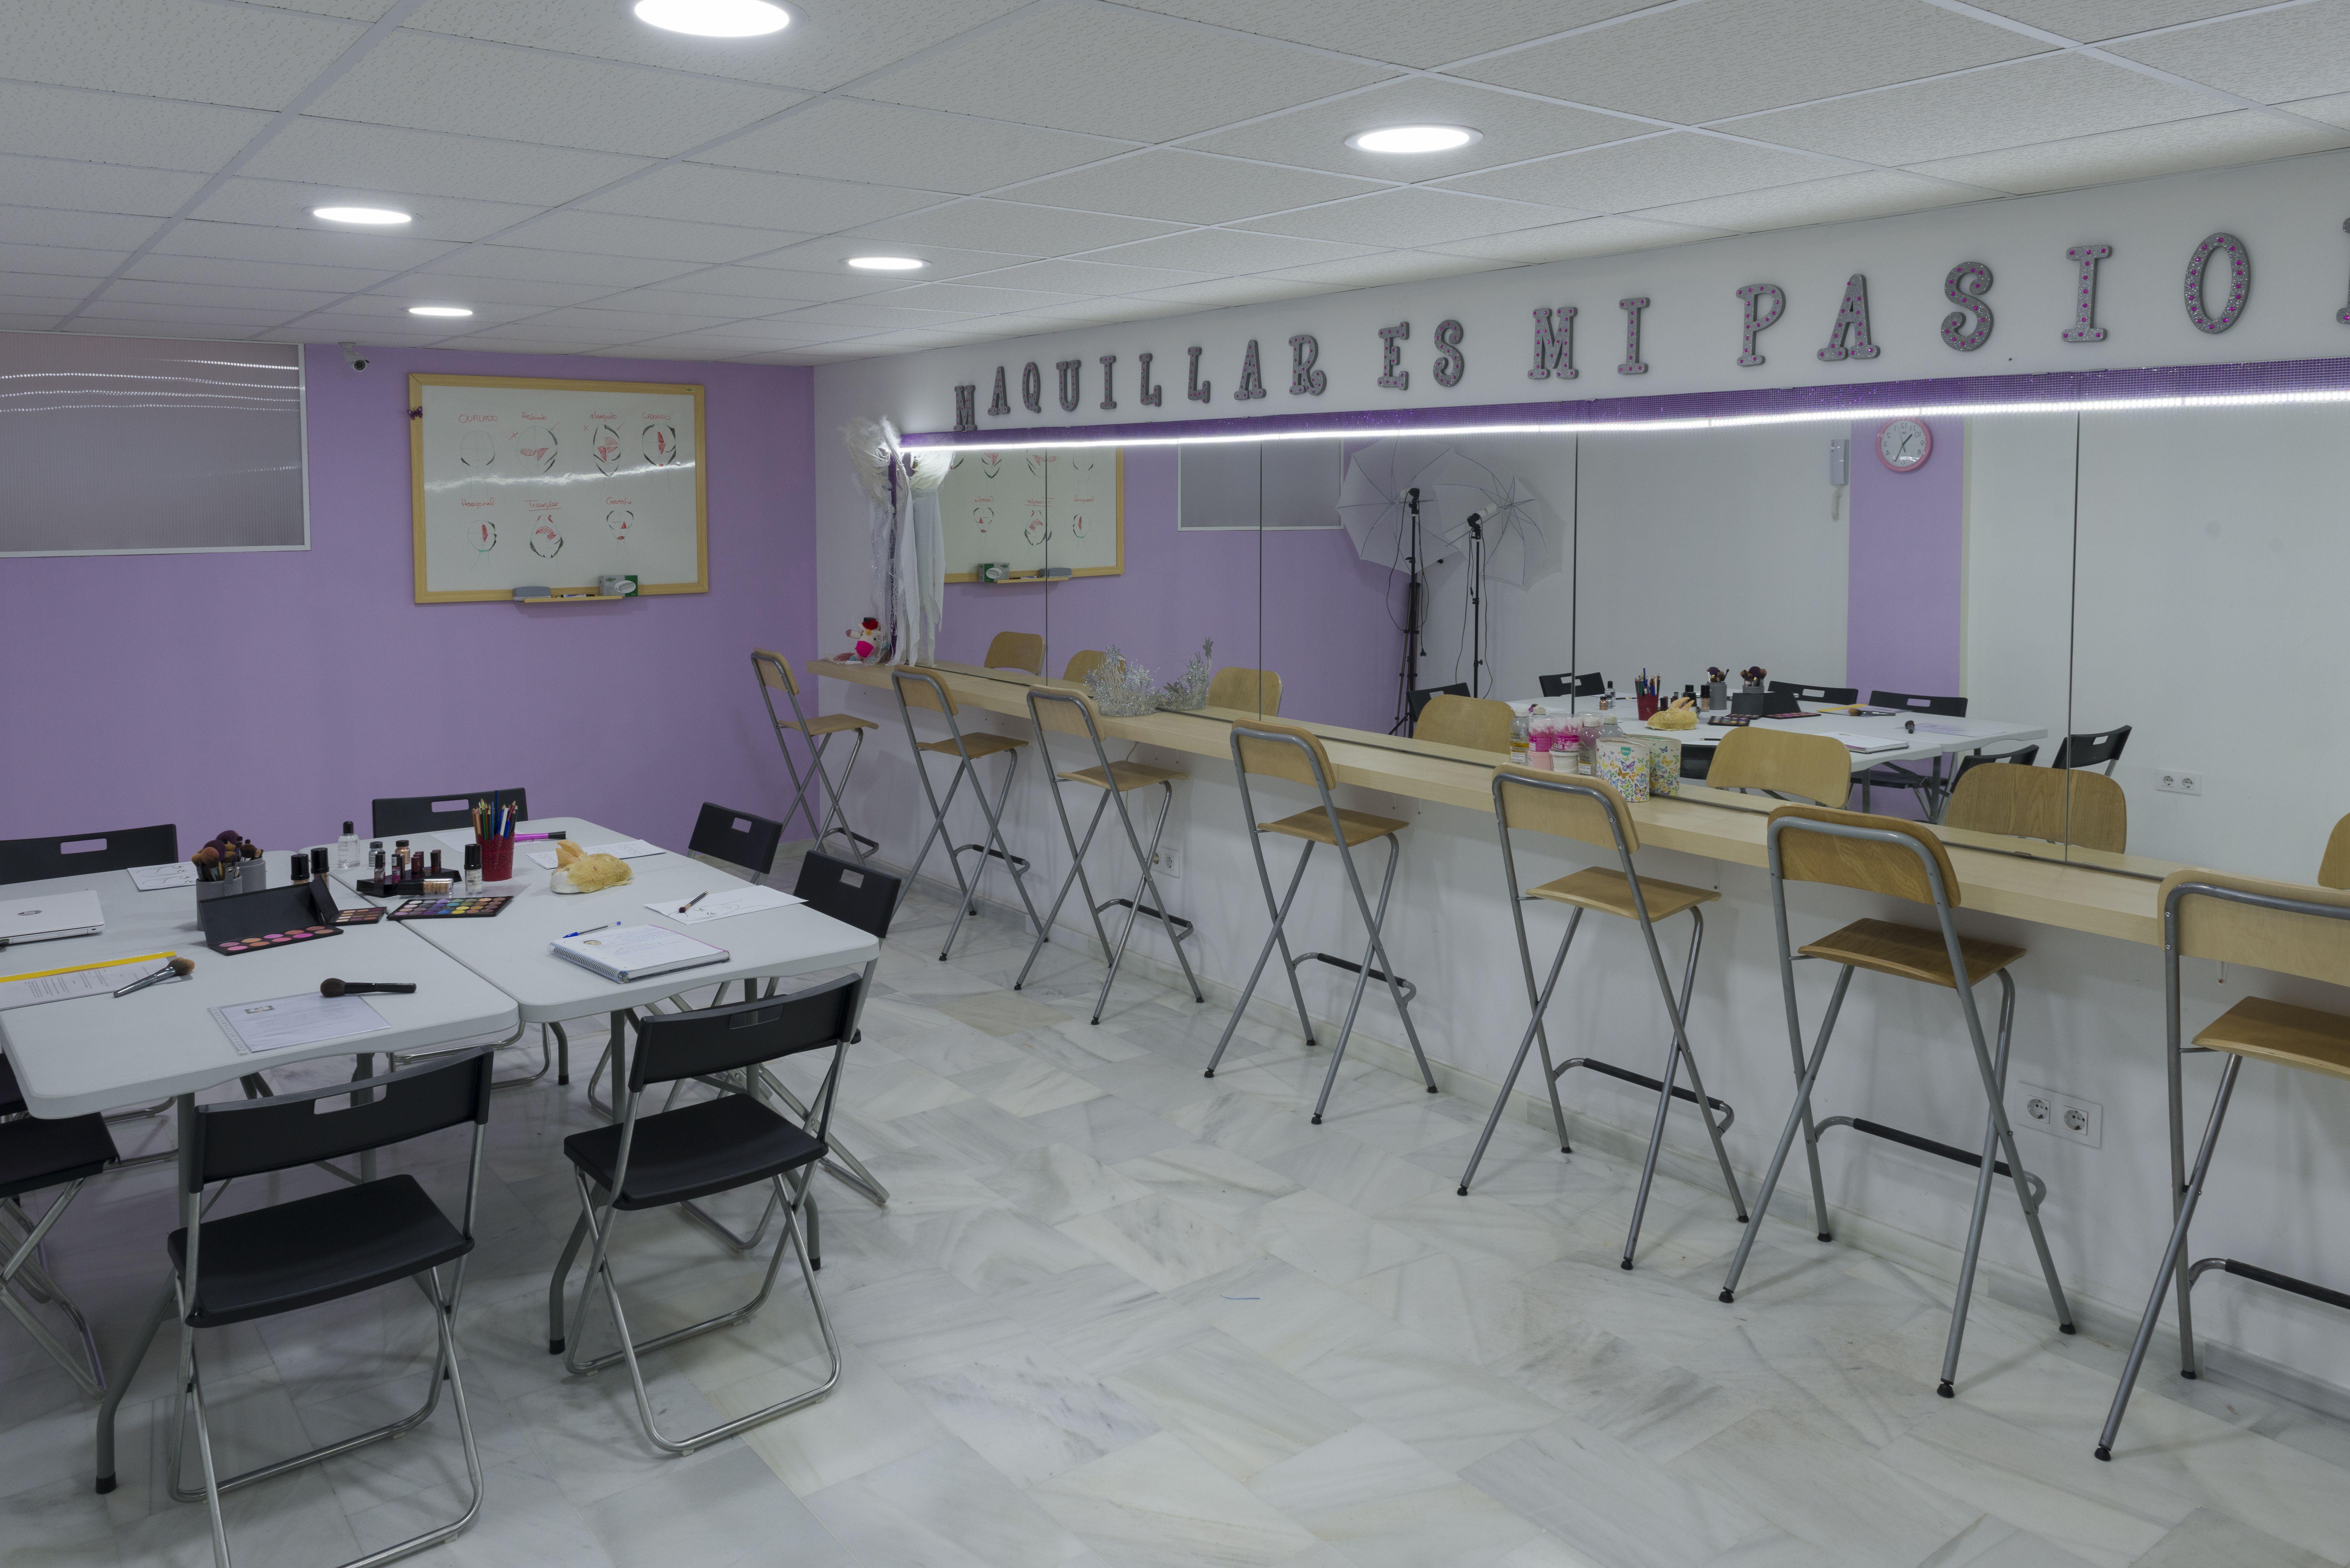 Foto 2 de Maquillaje en Jerez de la Frontera | Brush Up Escuela